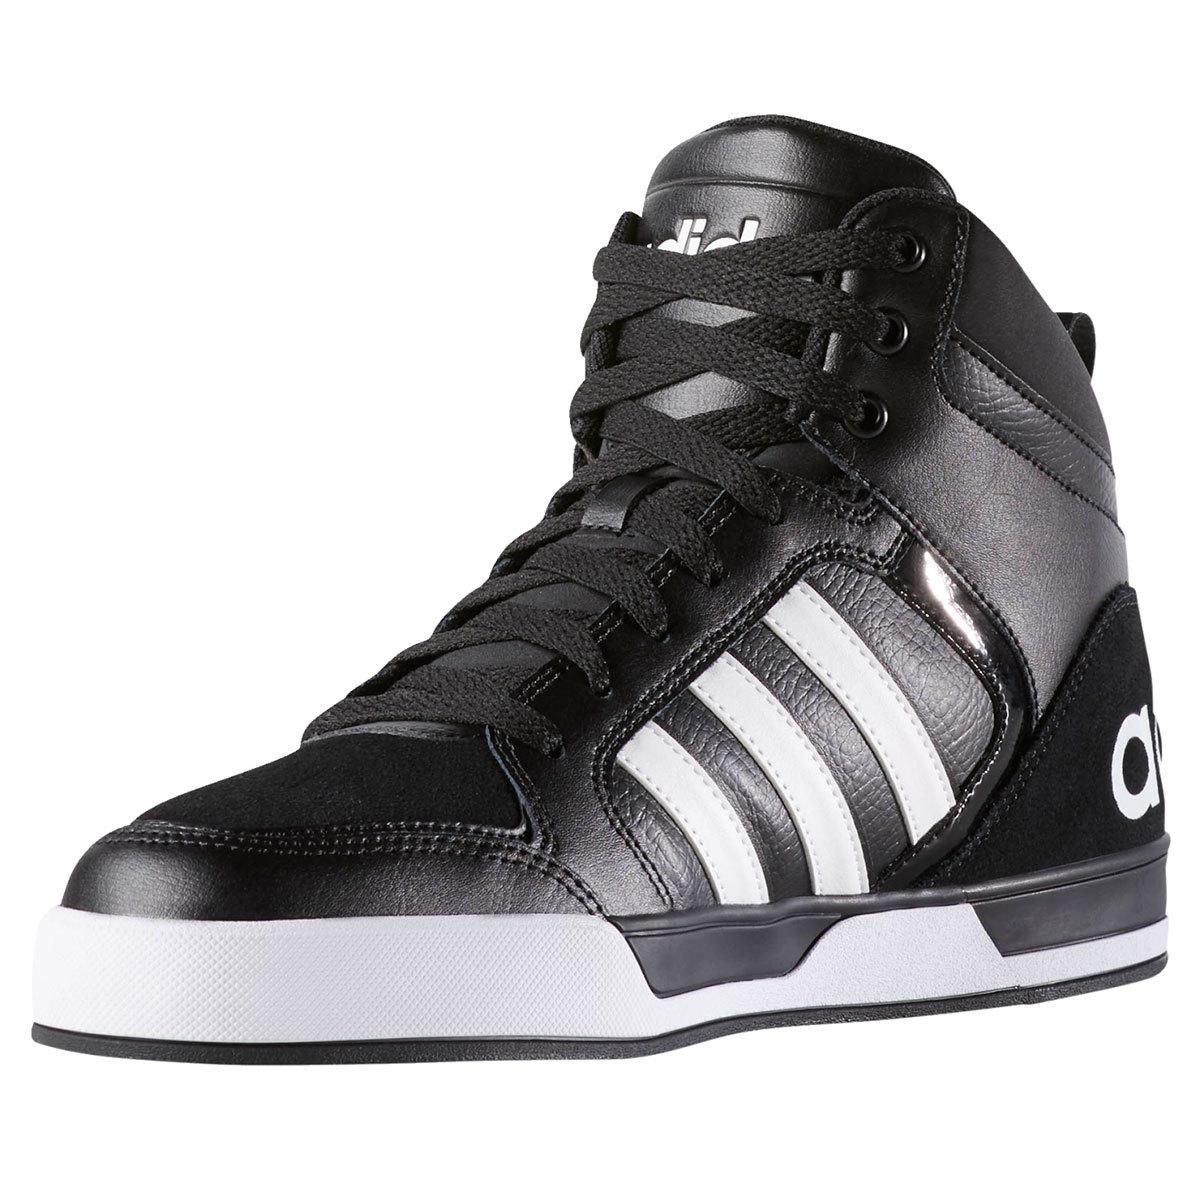 adidas raleigh 9tis mens sneakers cheap